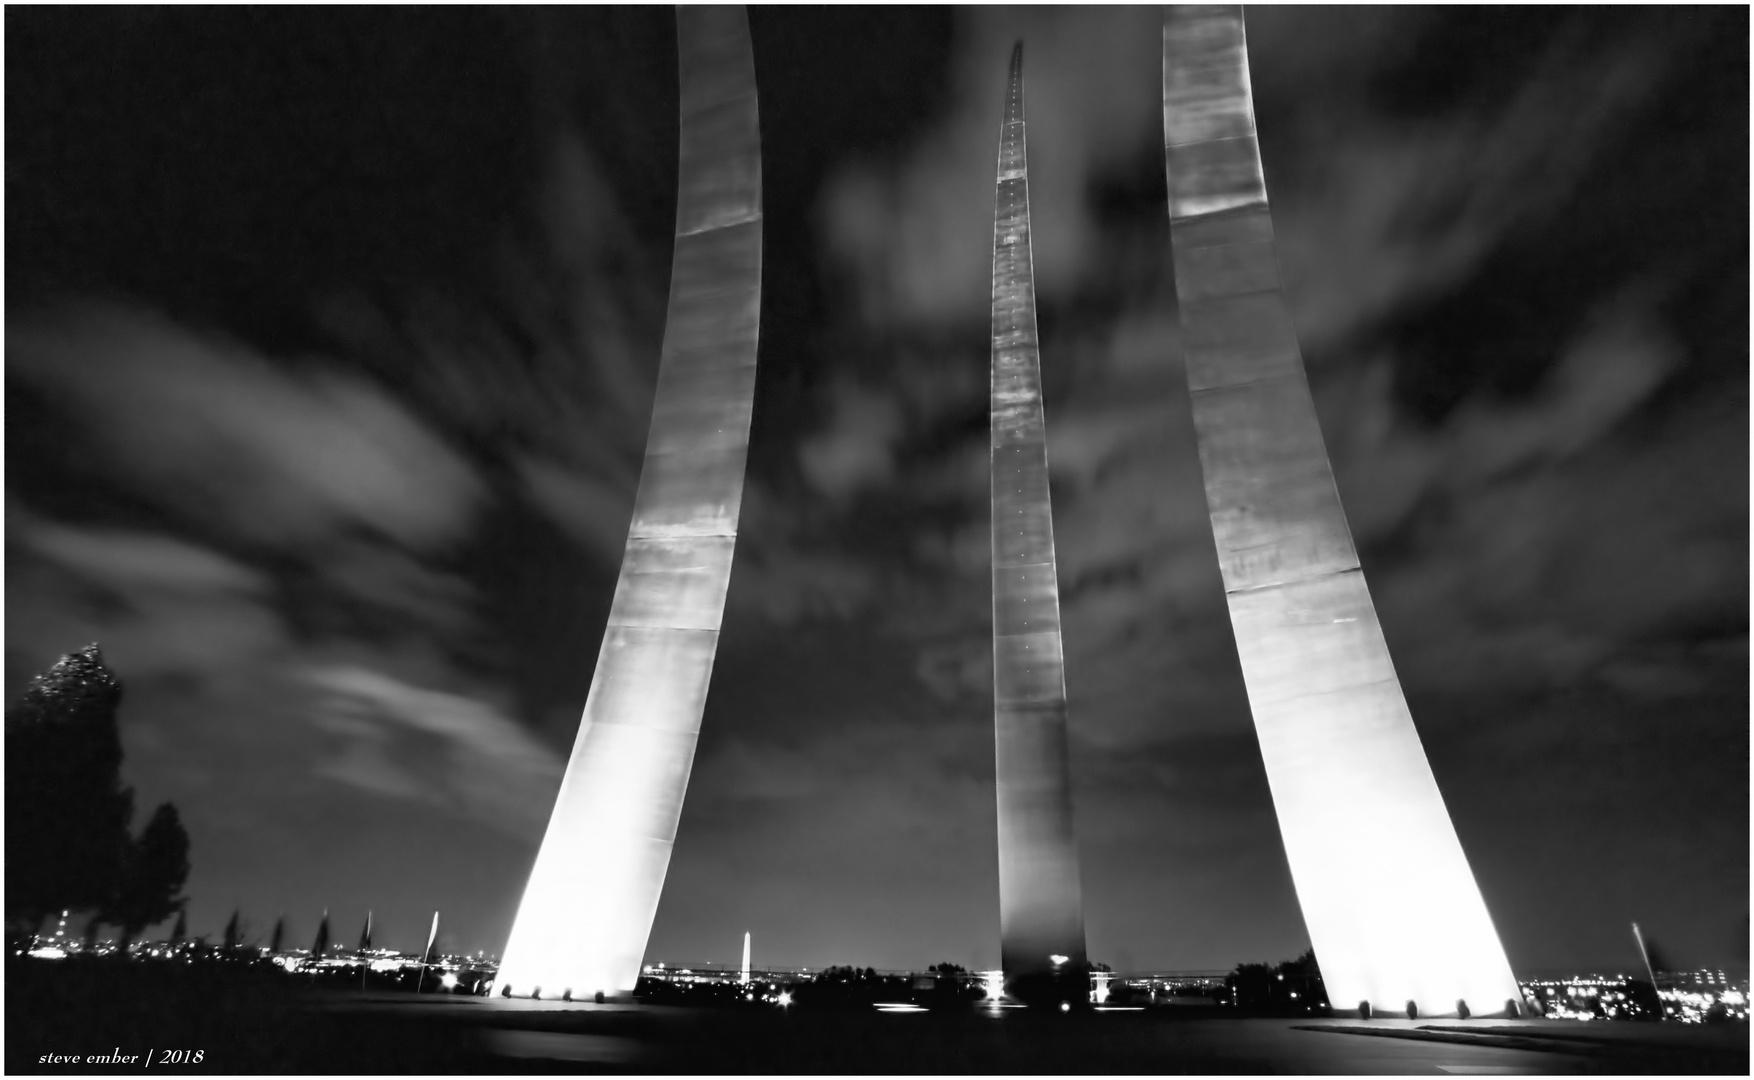 U.S. Air Force Memorial by Night